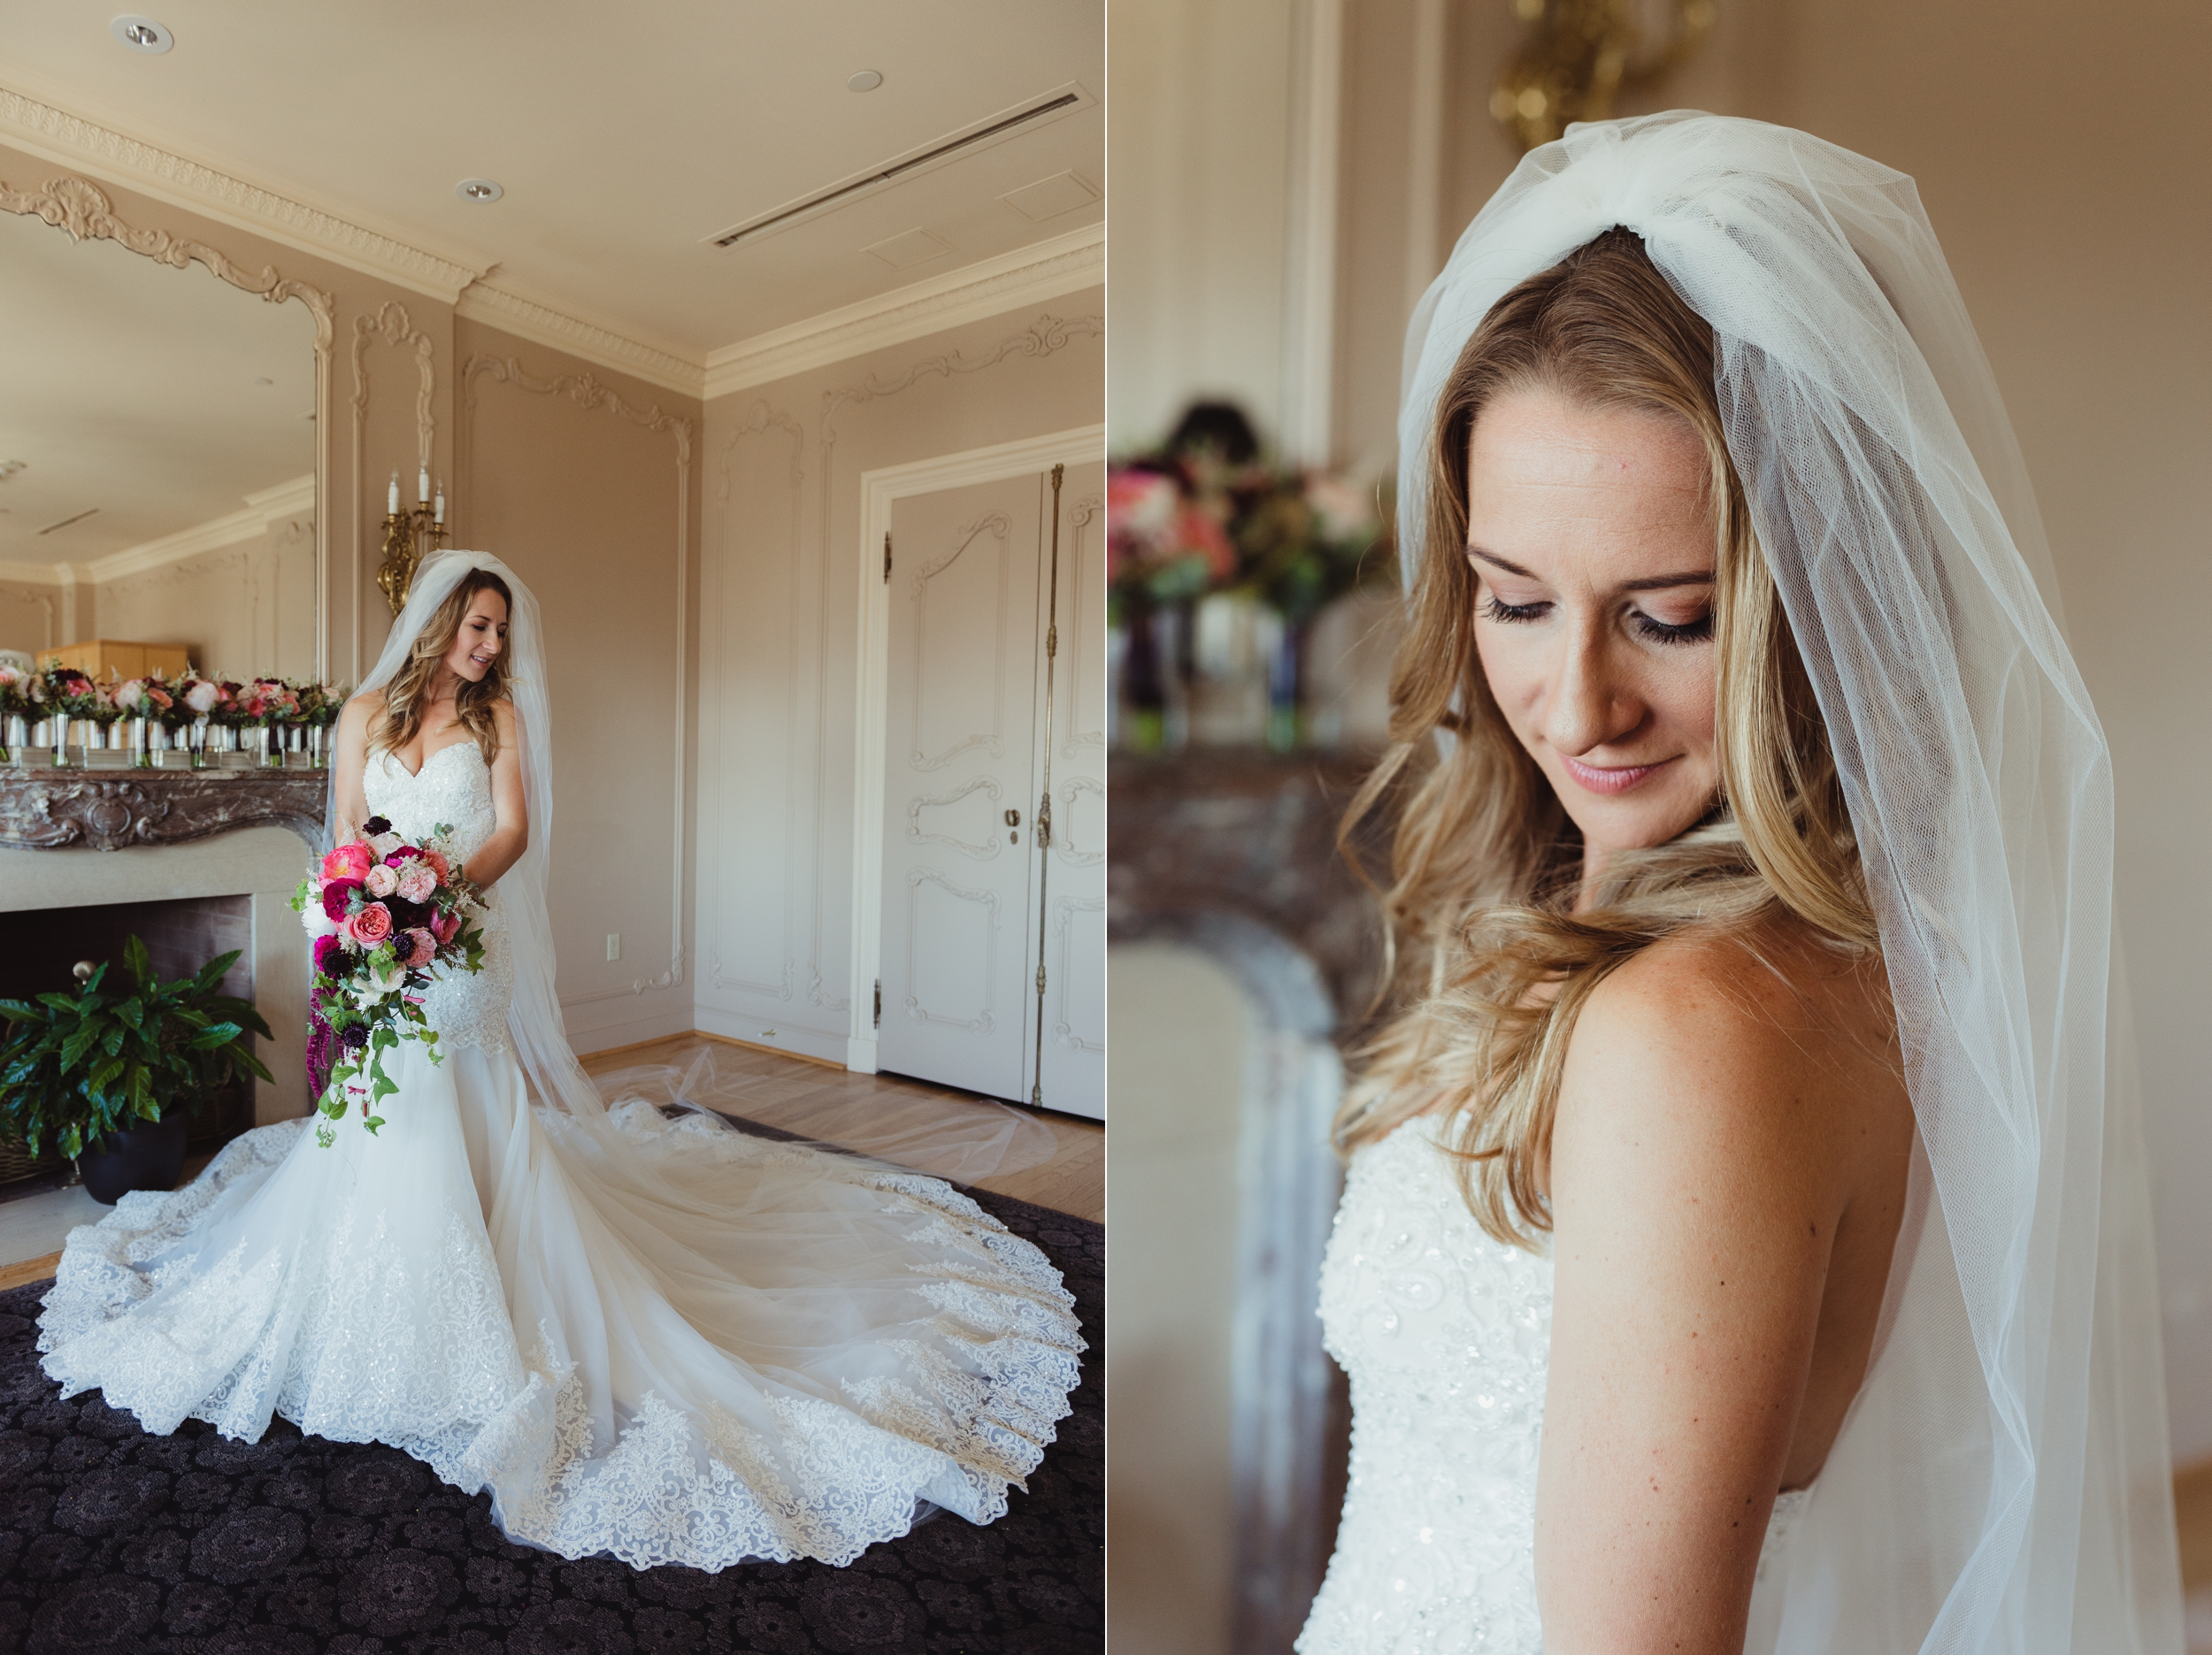 22-elegant-san-francisco-city-hall-wedding-vivianchen-0622_WEB.jpg